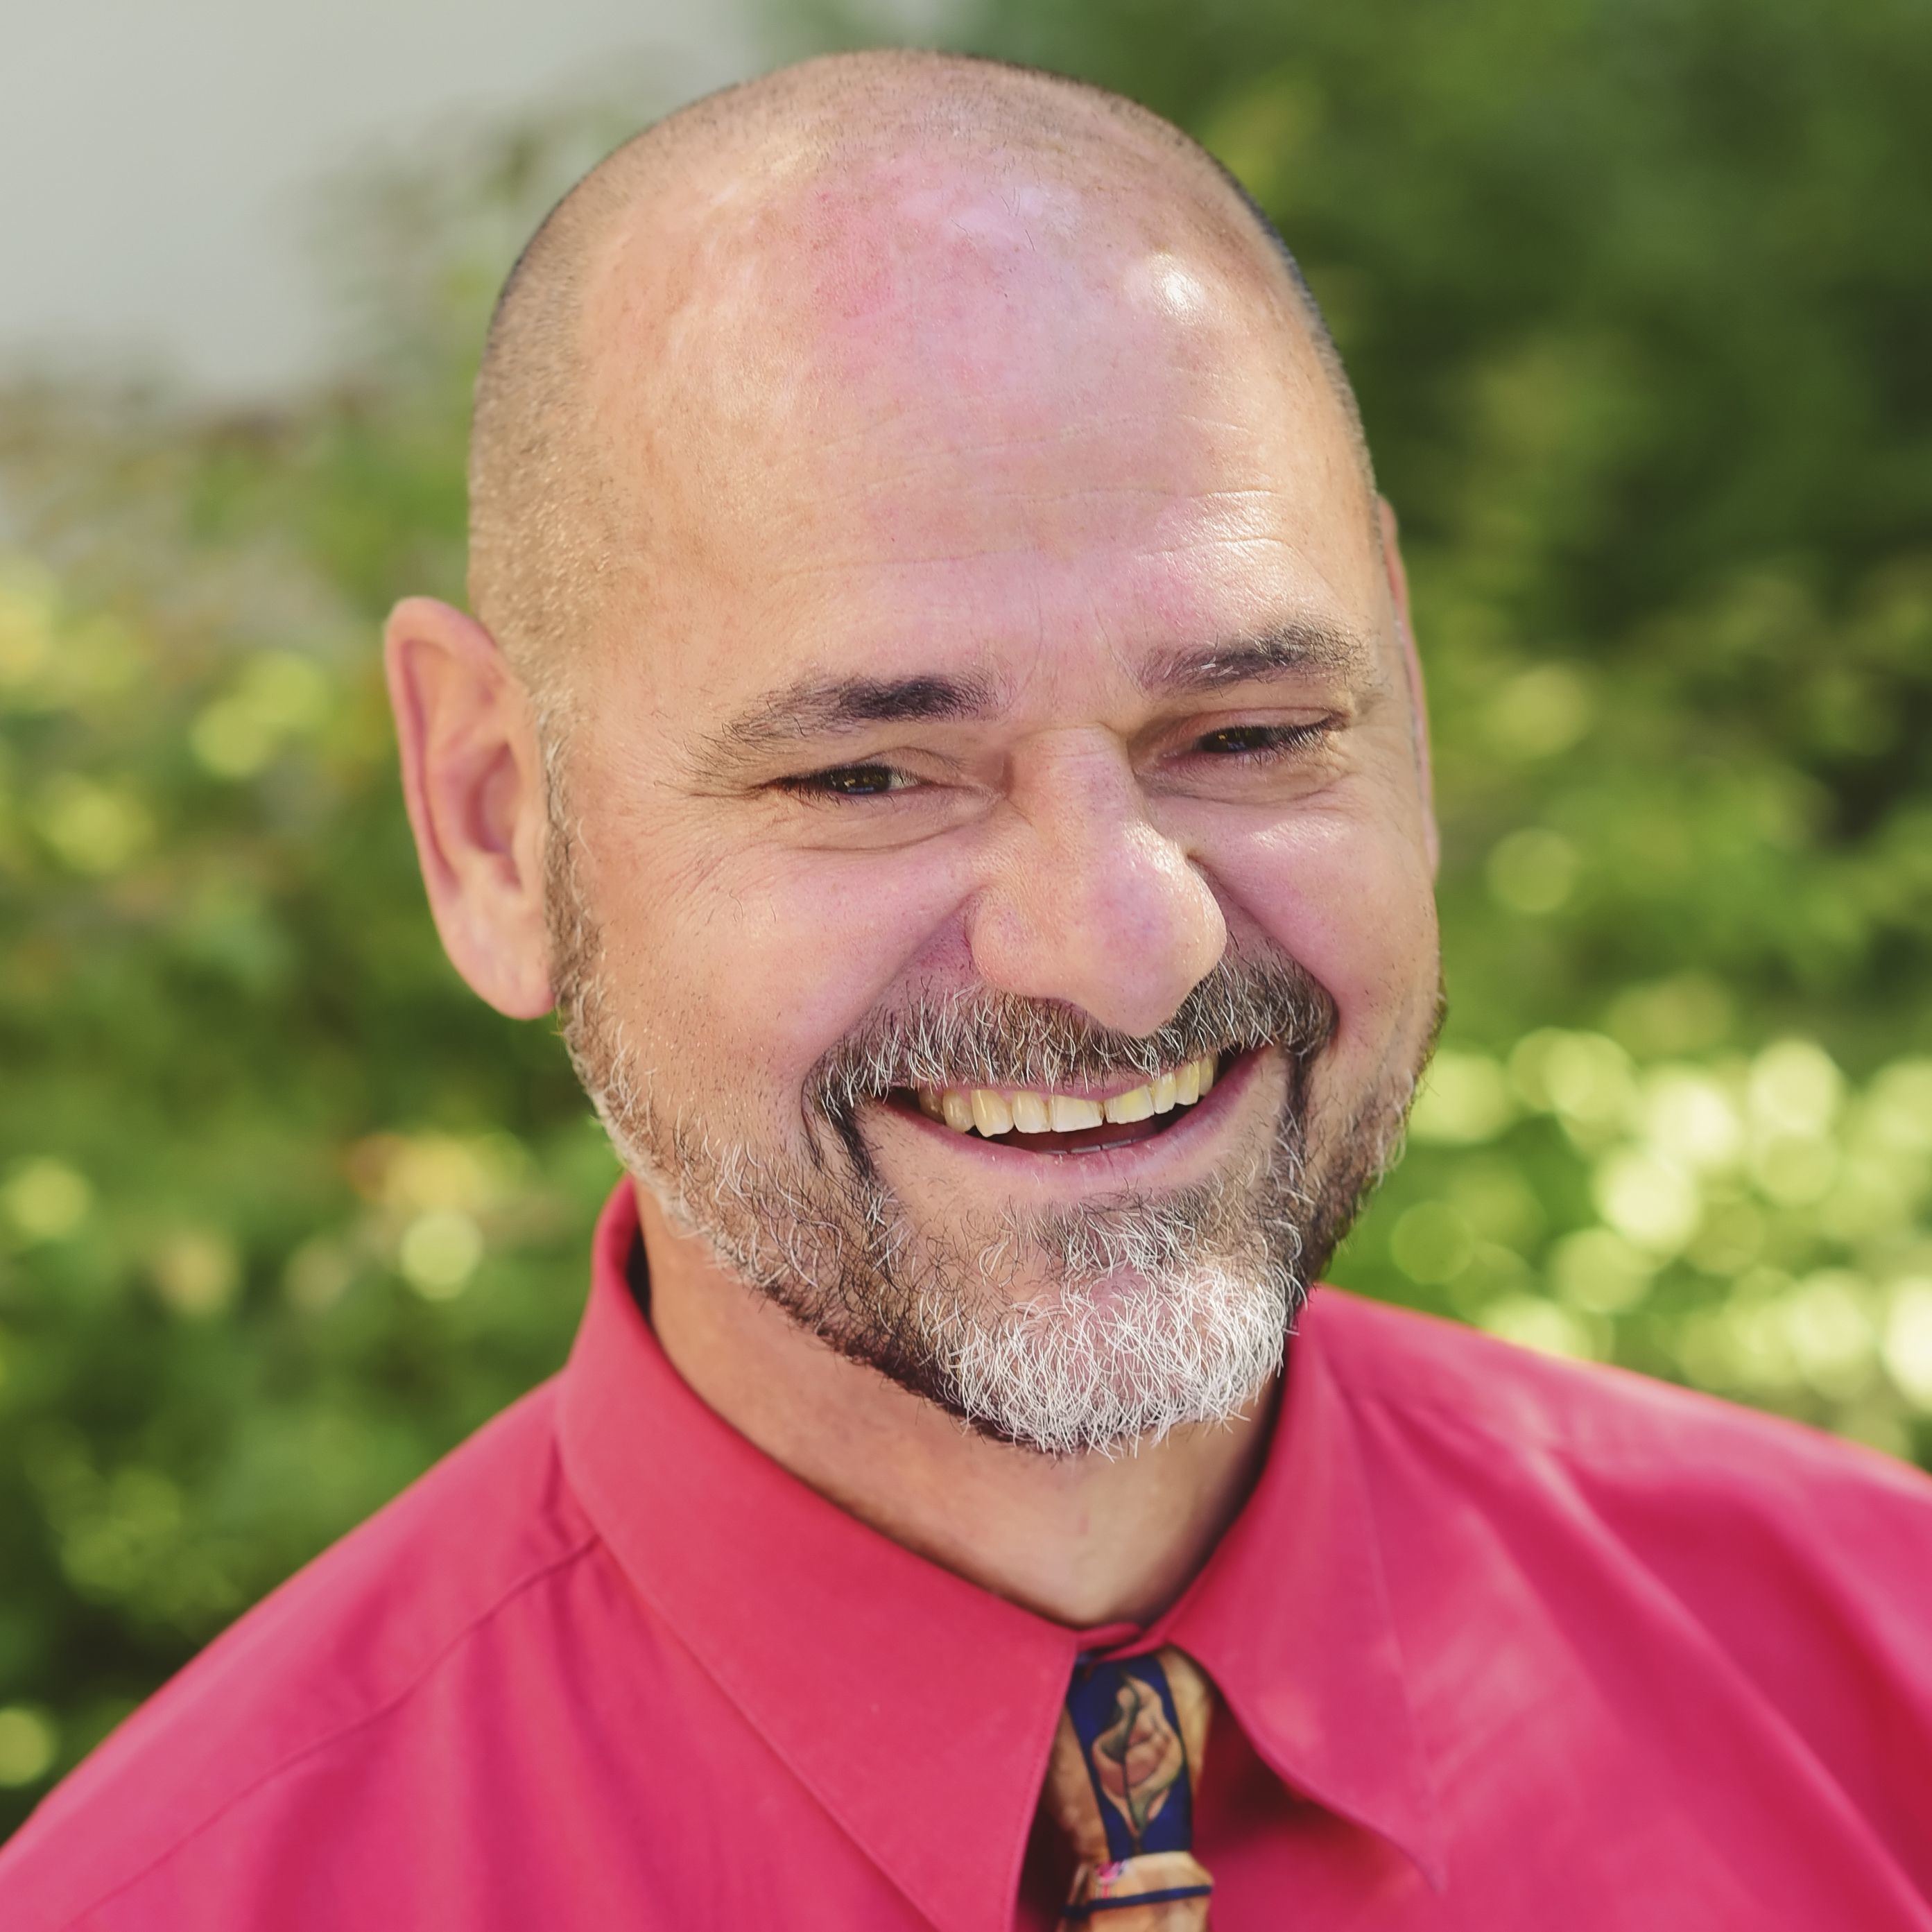 Mr. Daniel Ritchey